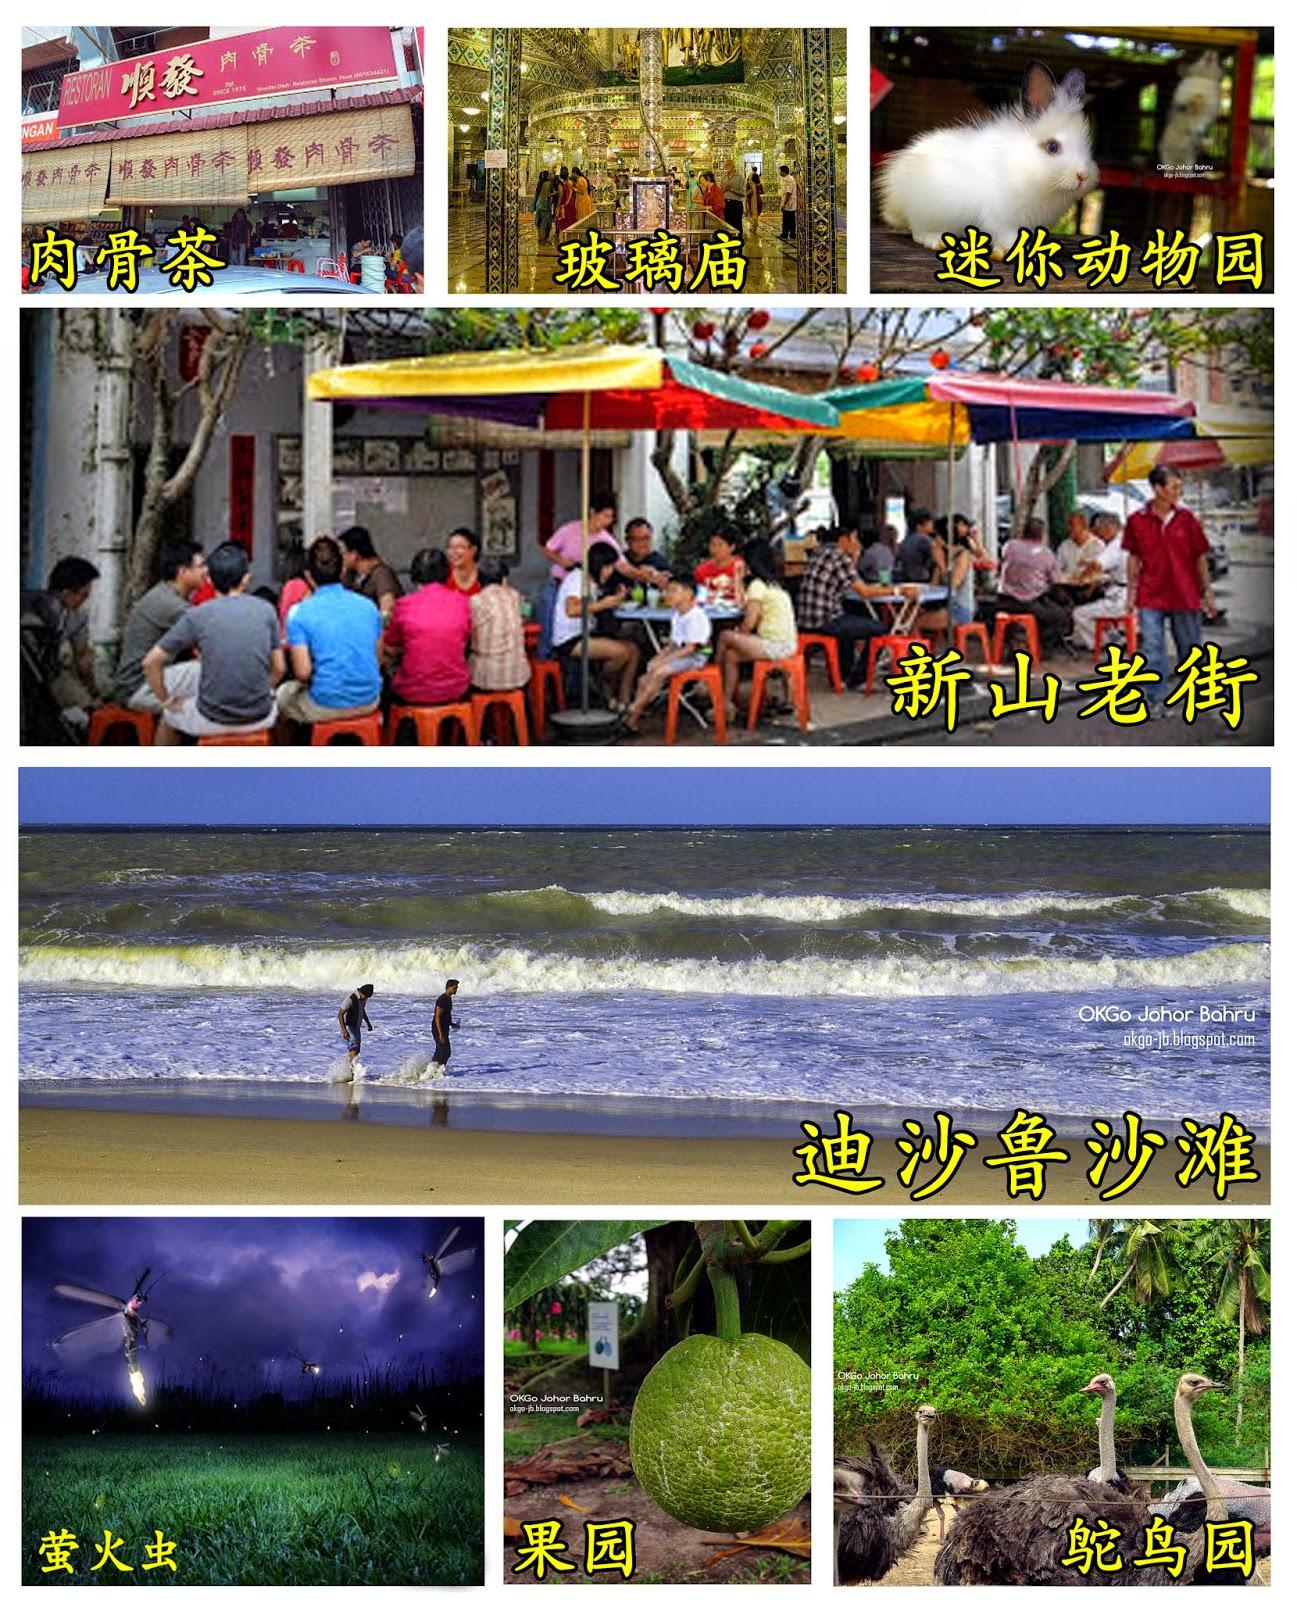 Best of Johor Bahru day tour